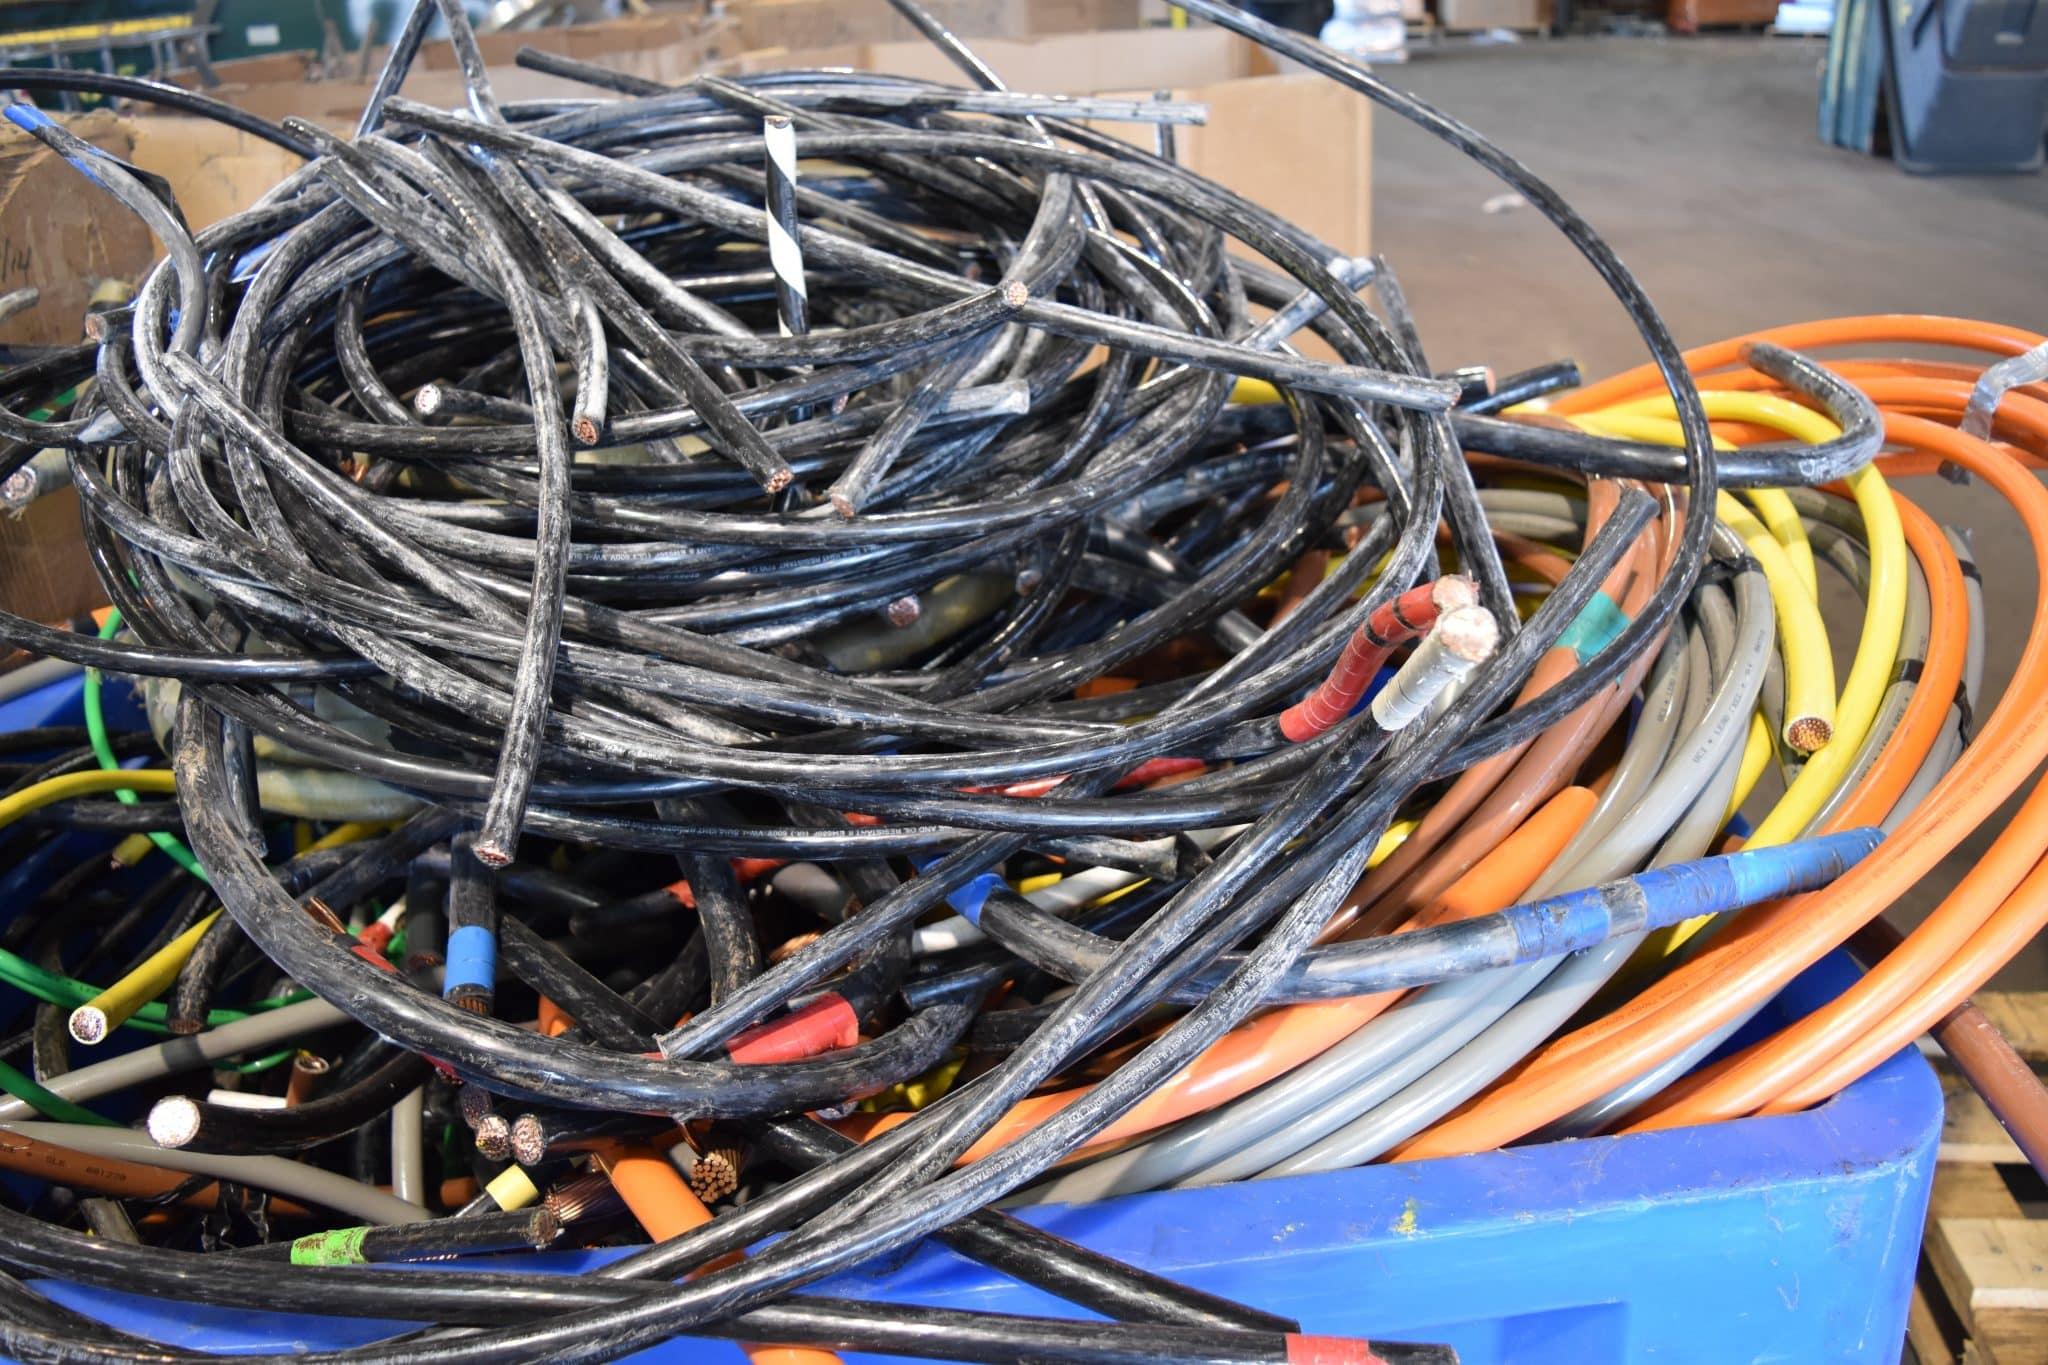 Metal Monday: Tips On Separating Scrap Wires - iScrap App